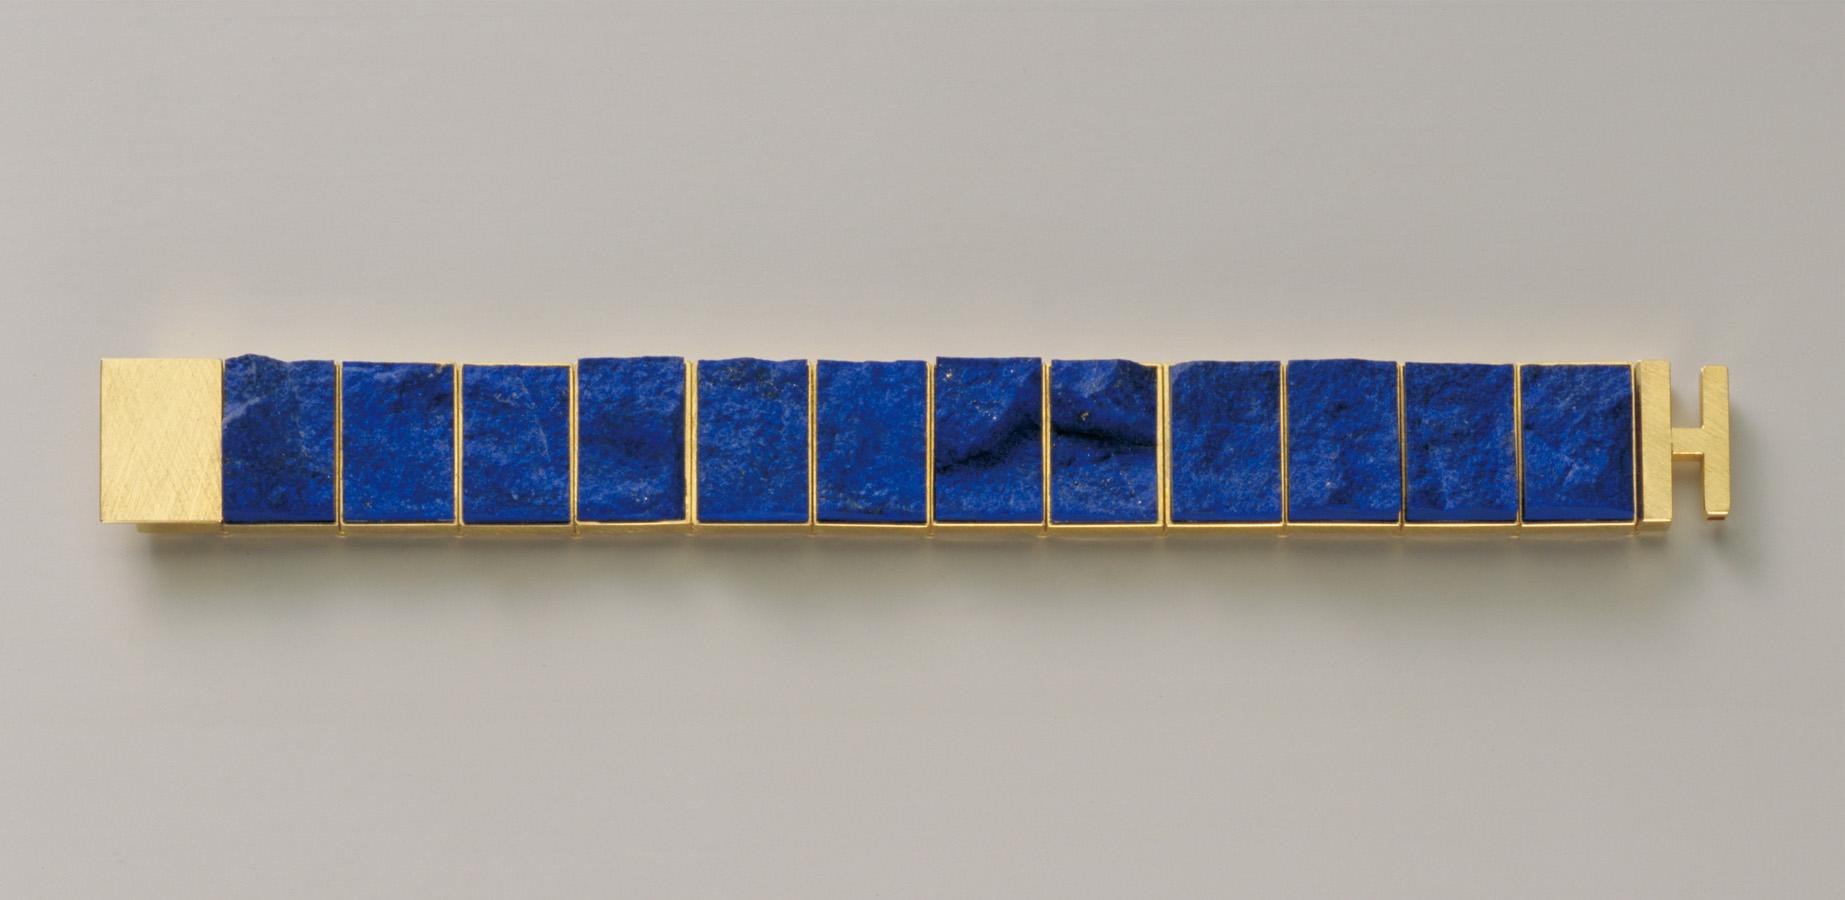 bracelet  2005  gold 750  lapislazuli  176x19  mm